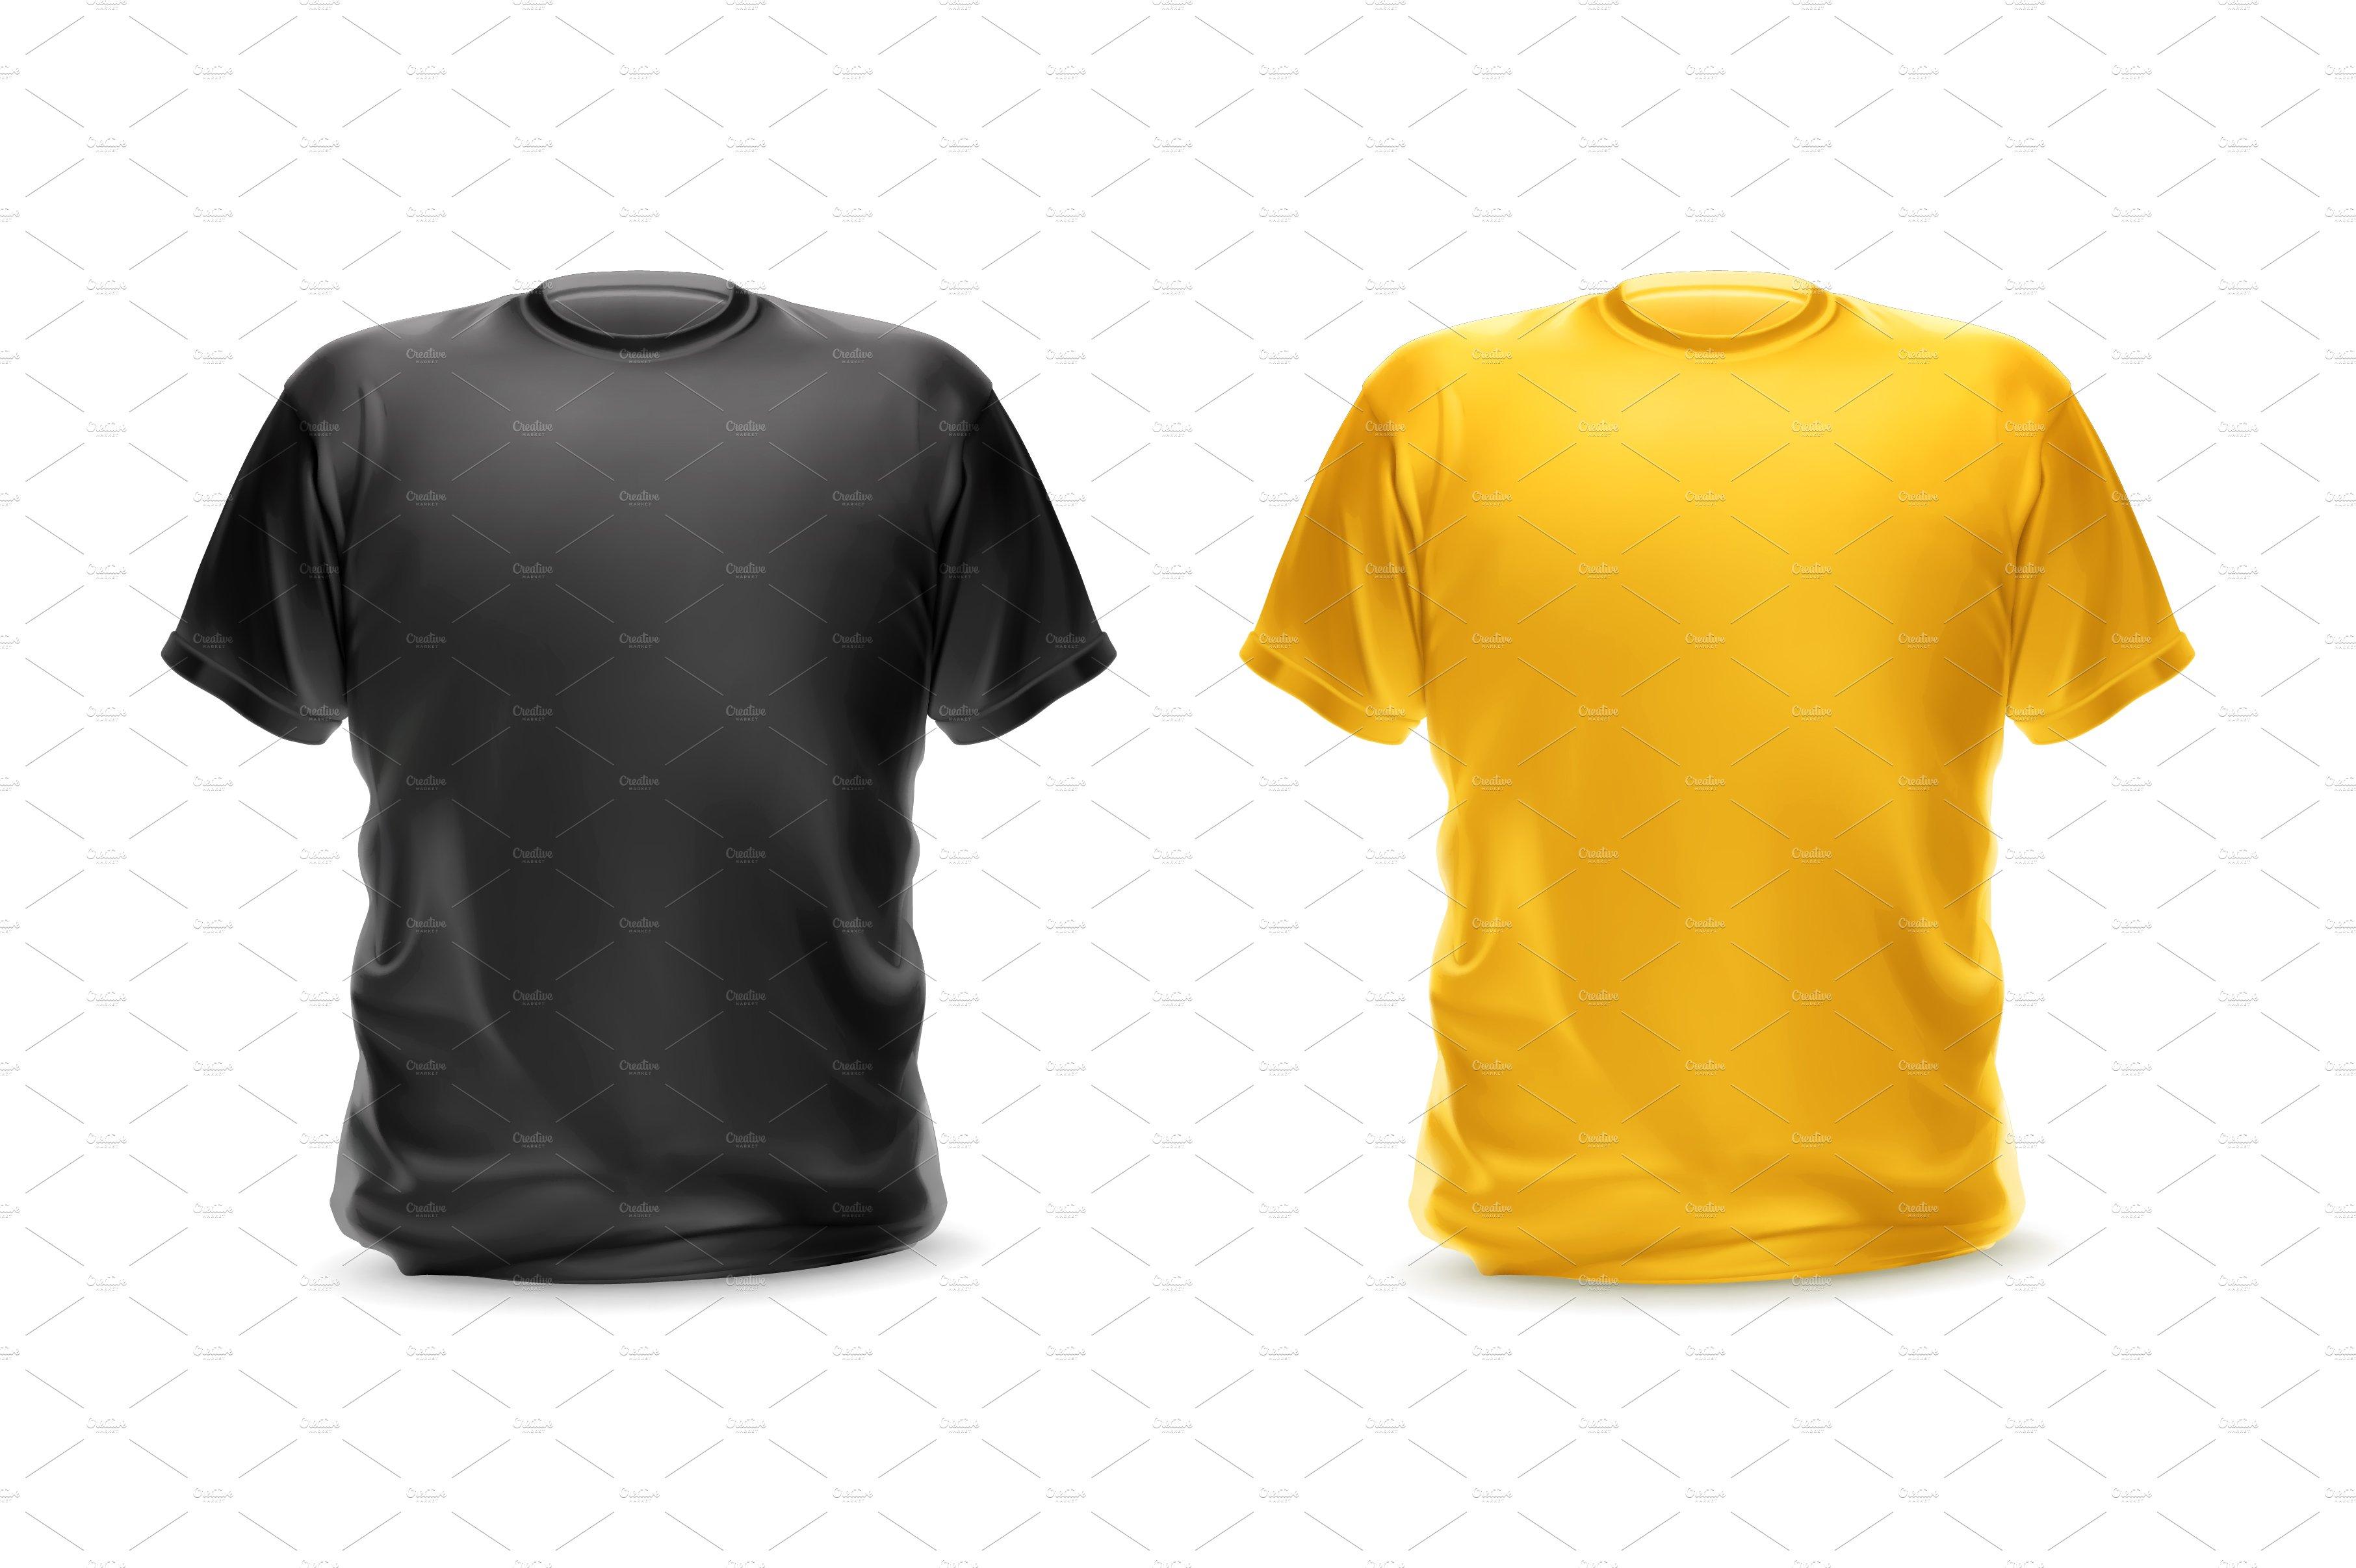 Black t shirt vector photoshop - Black T Shirt Vector Photoshop 25